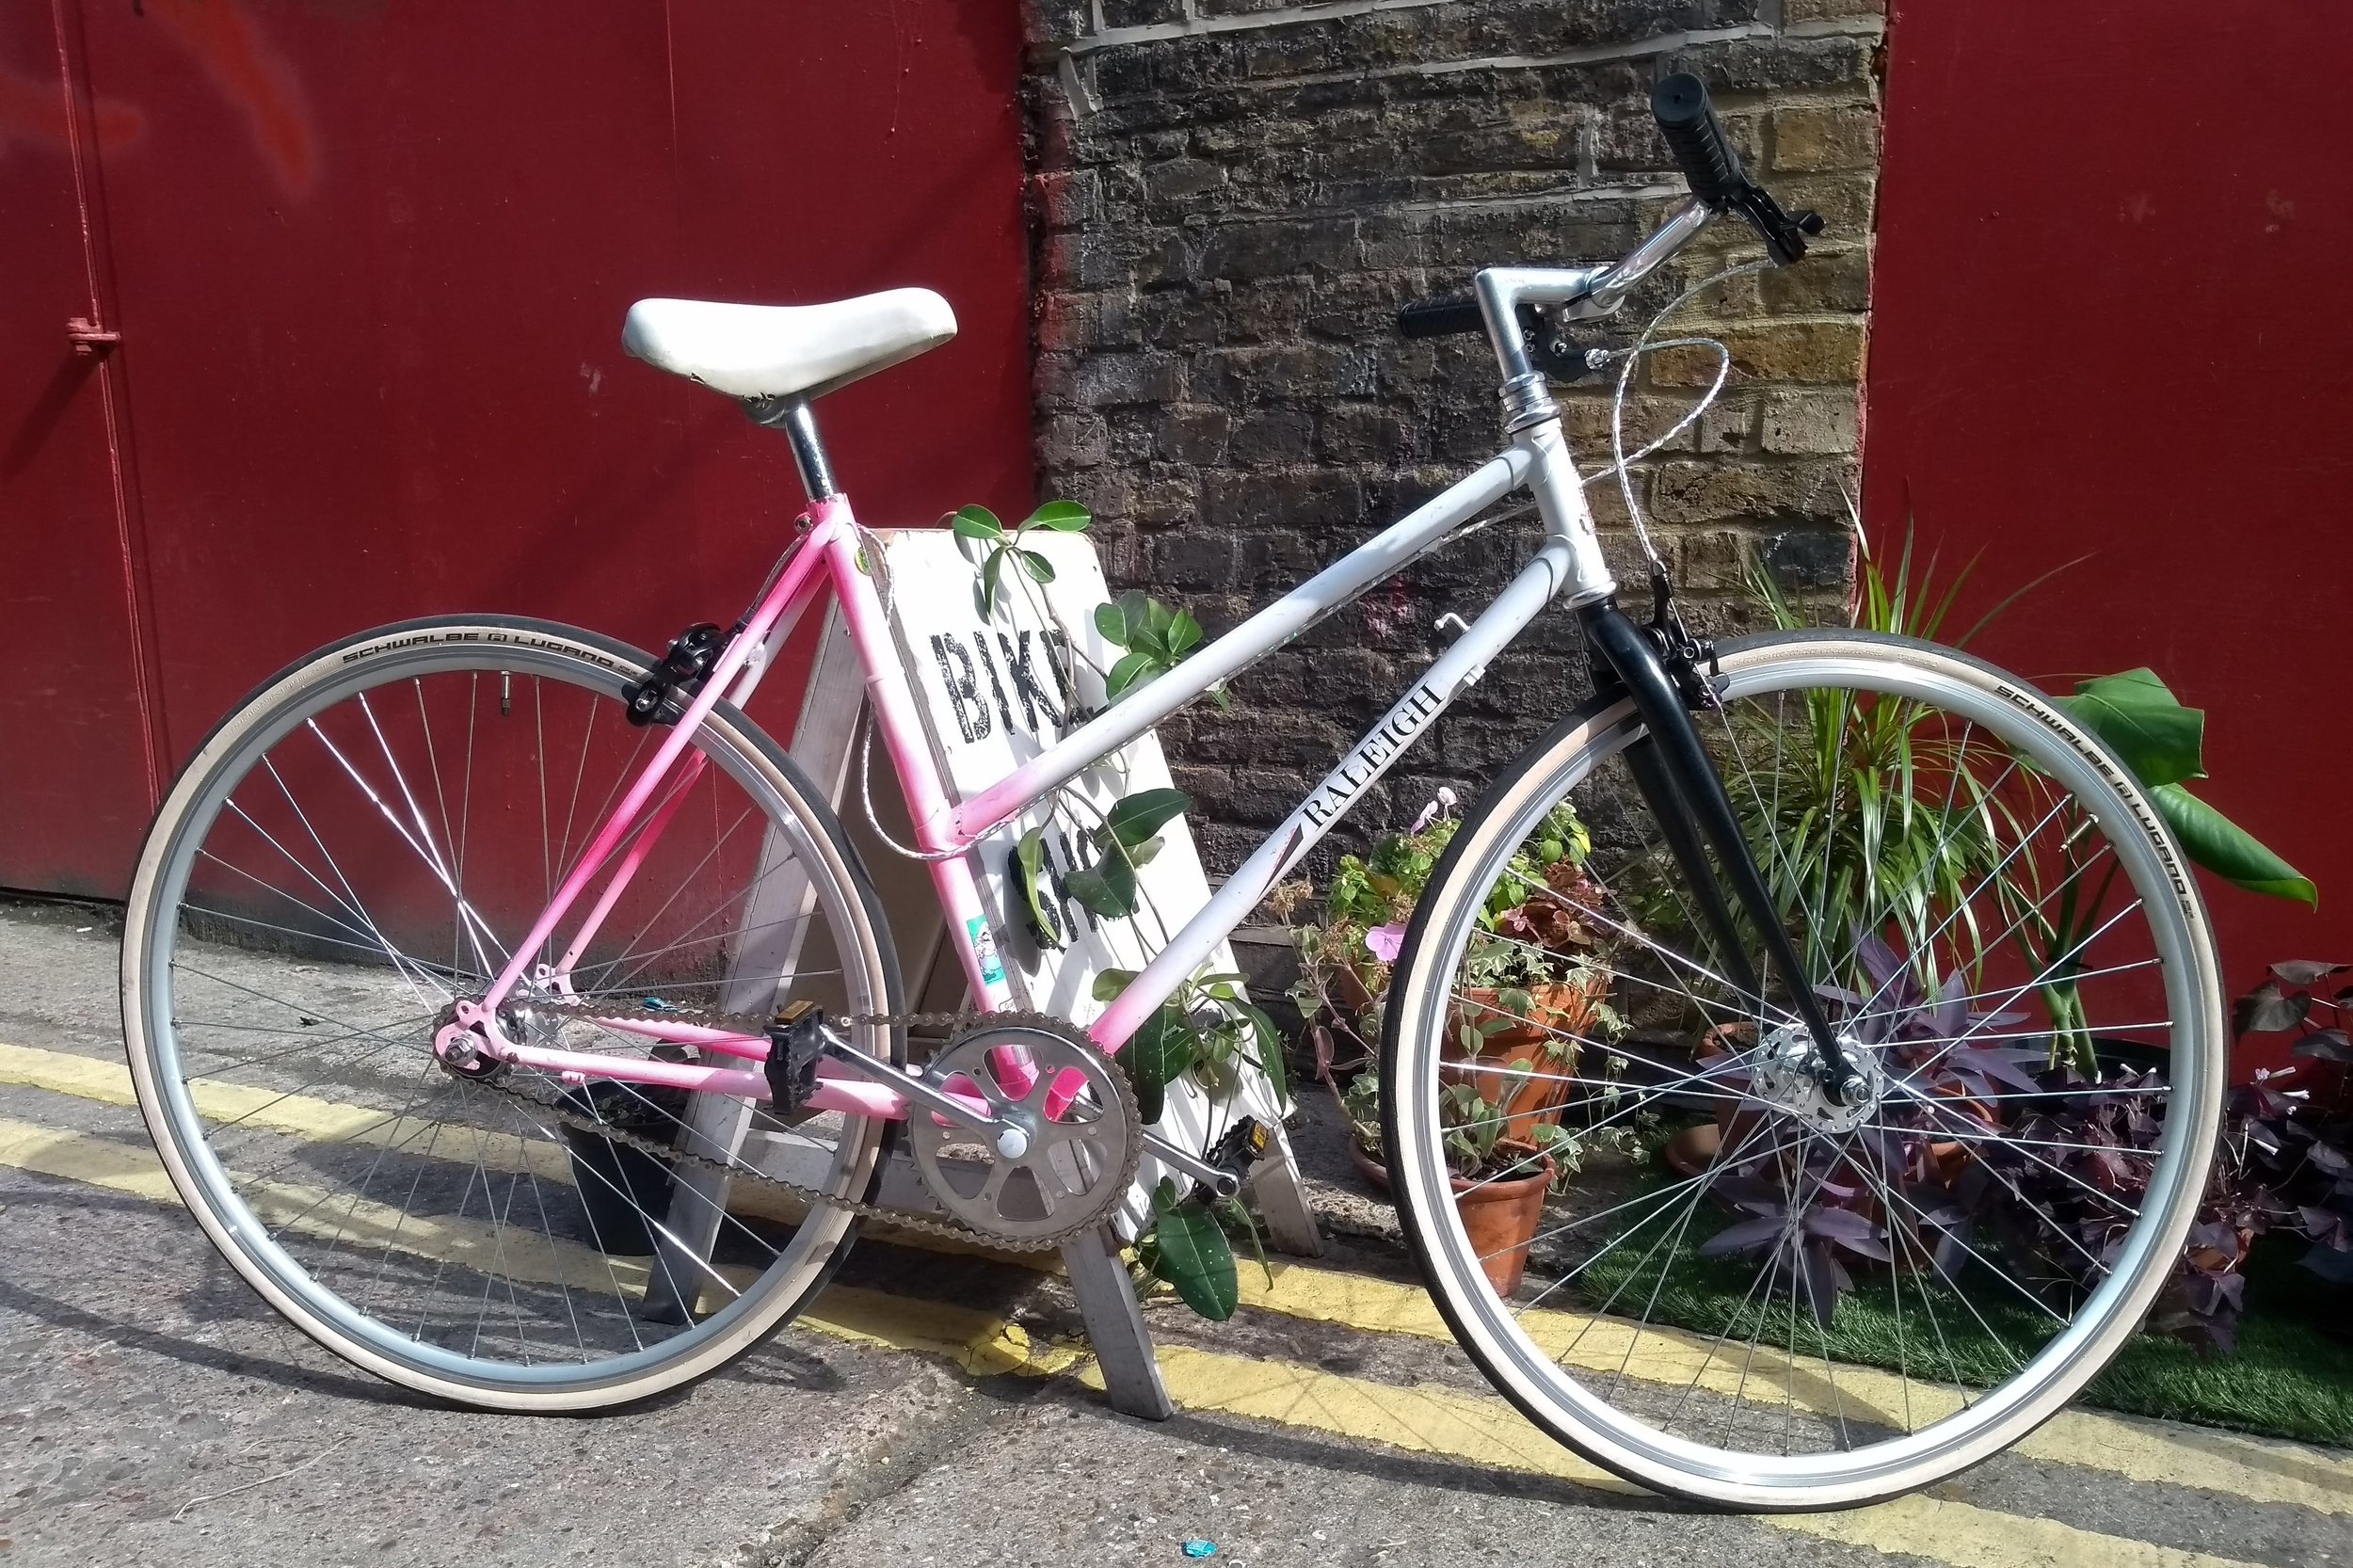 used-bicycle-london-review.jpg